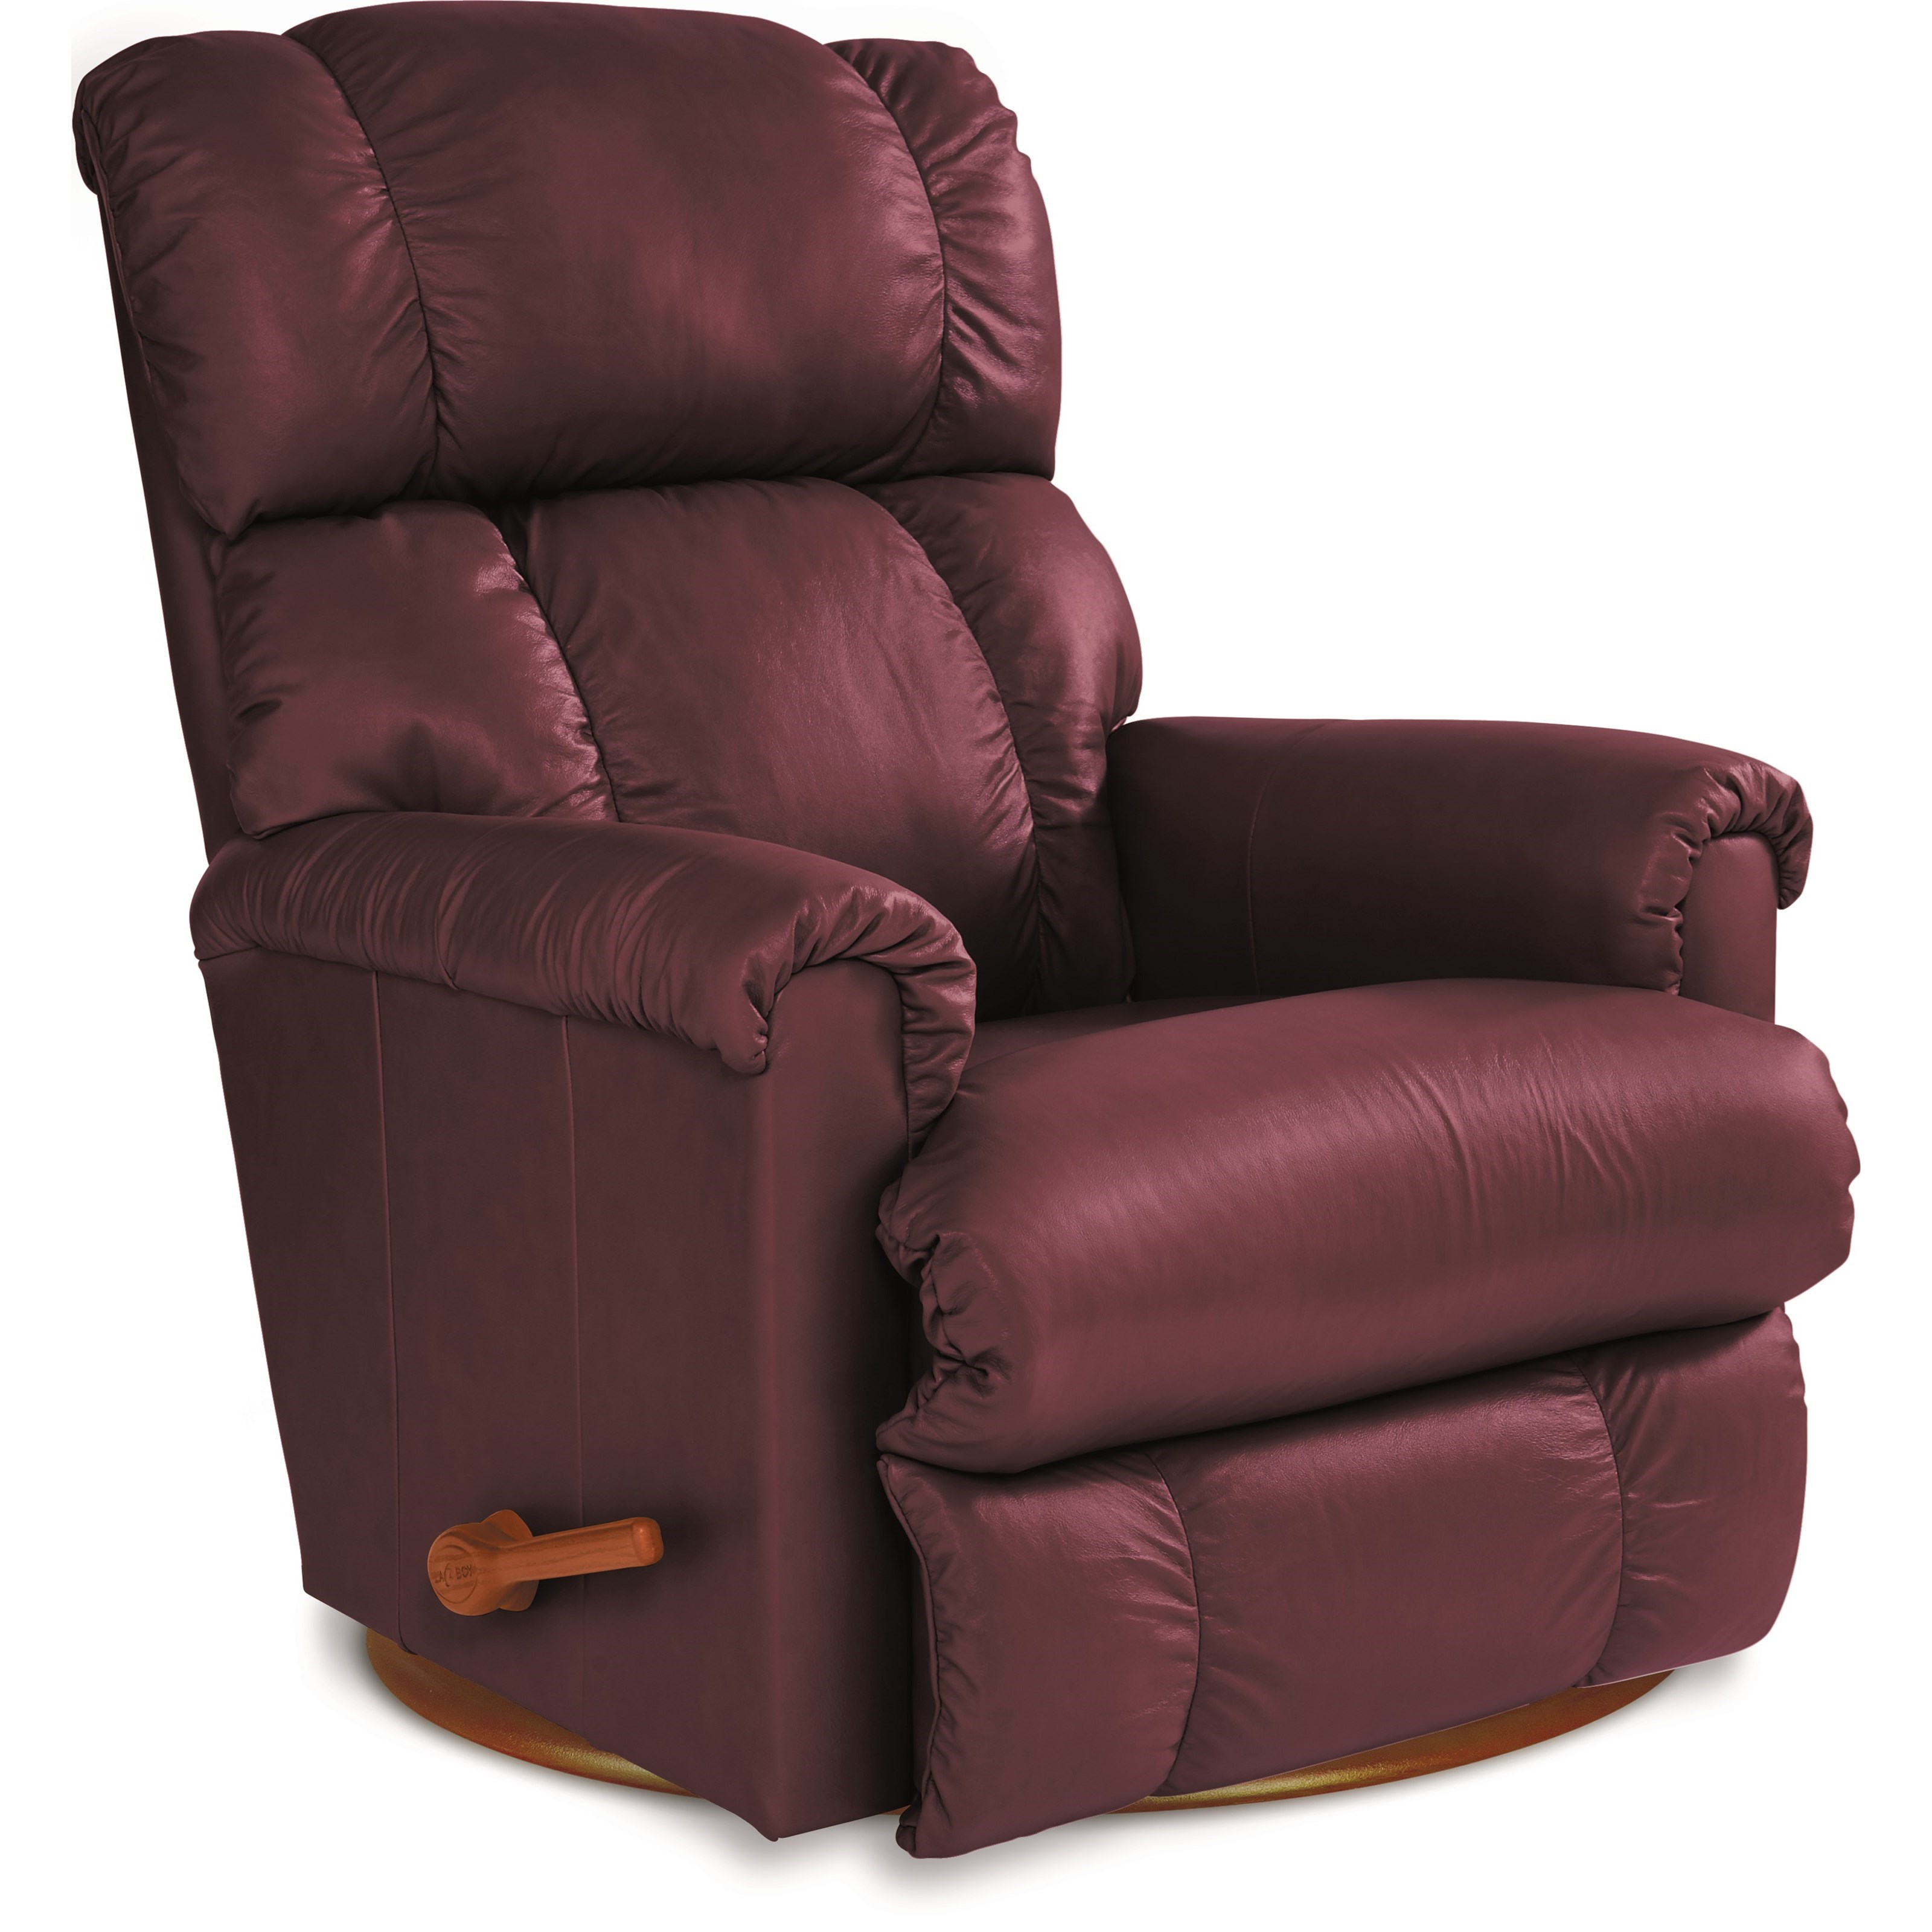 La Z Boy Pinnacle Reclina Rocker 174 Reclining Chair Knight